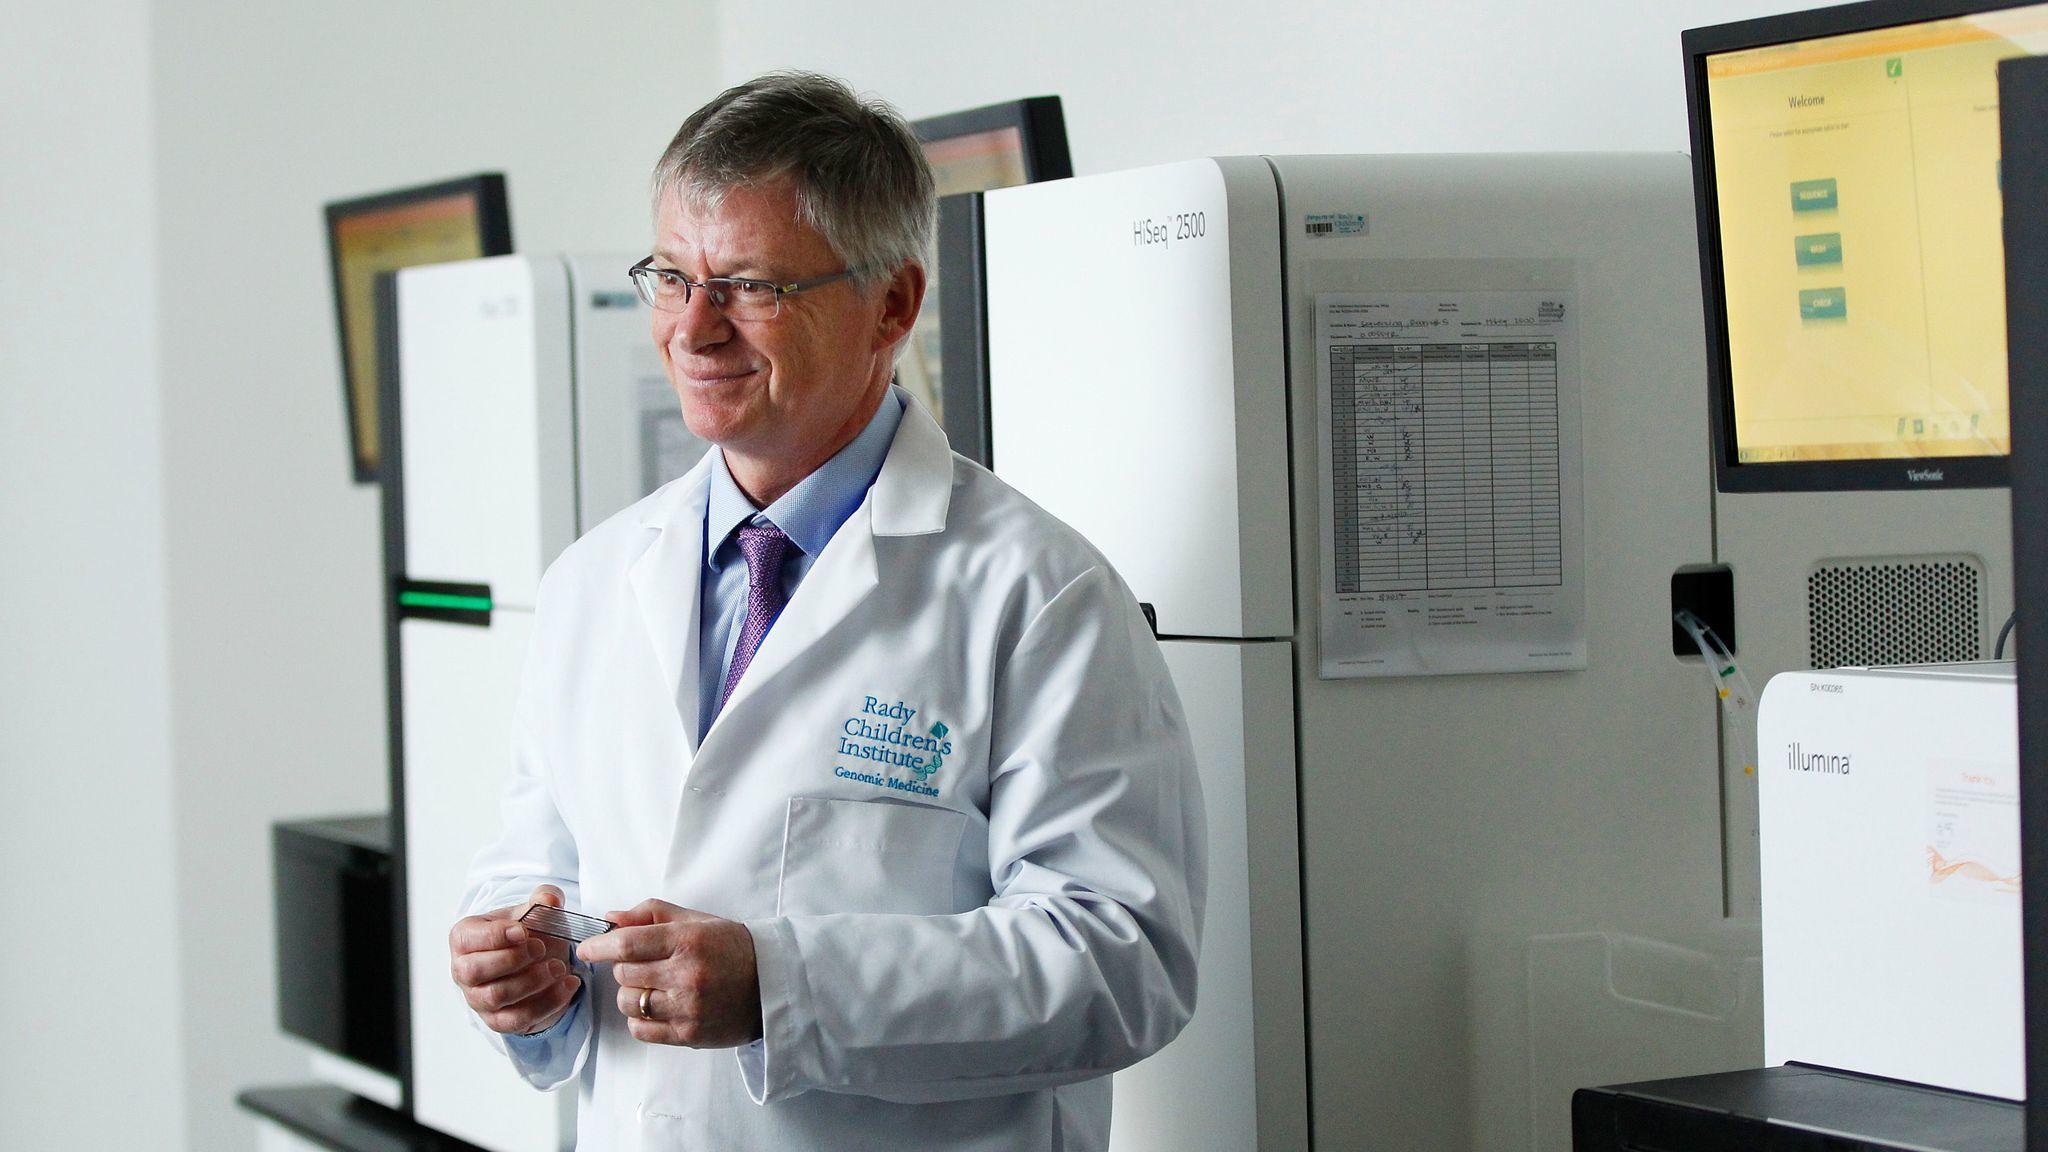 Dr. Stephen Kingsmore, director of the Rady Children's Institute of Genomic Medicine.